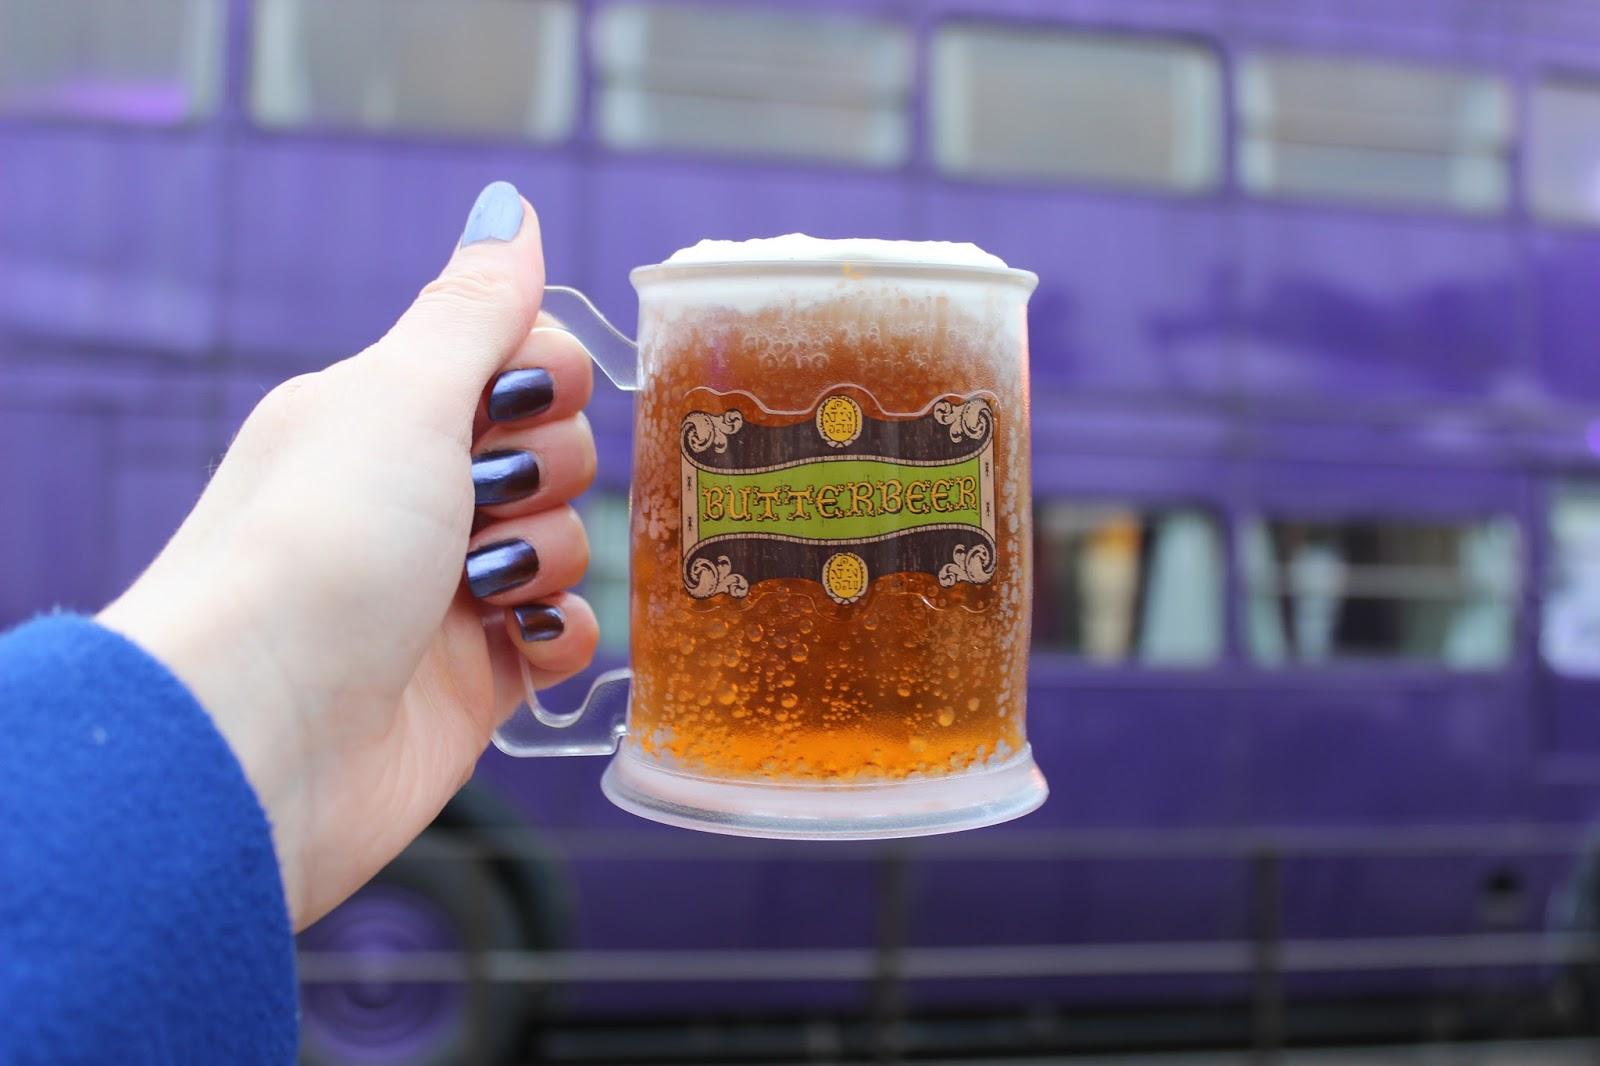 Harry Potter studio tour london butterbeer